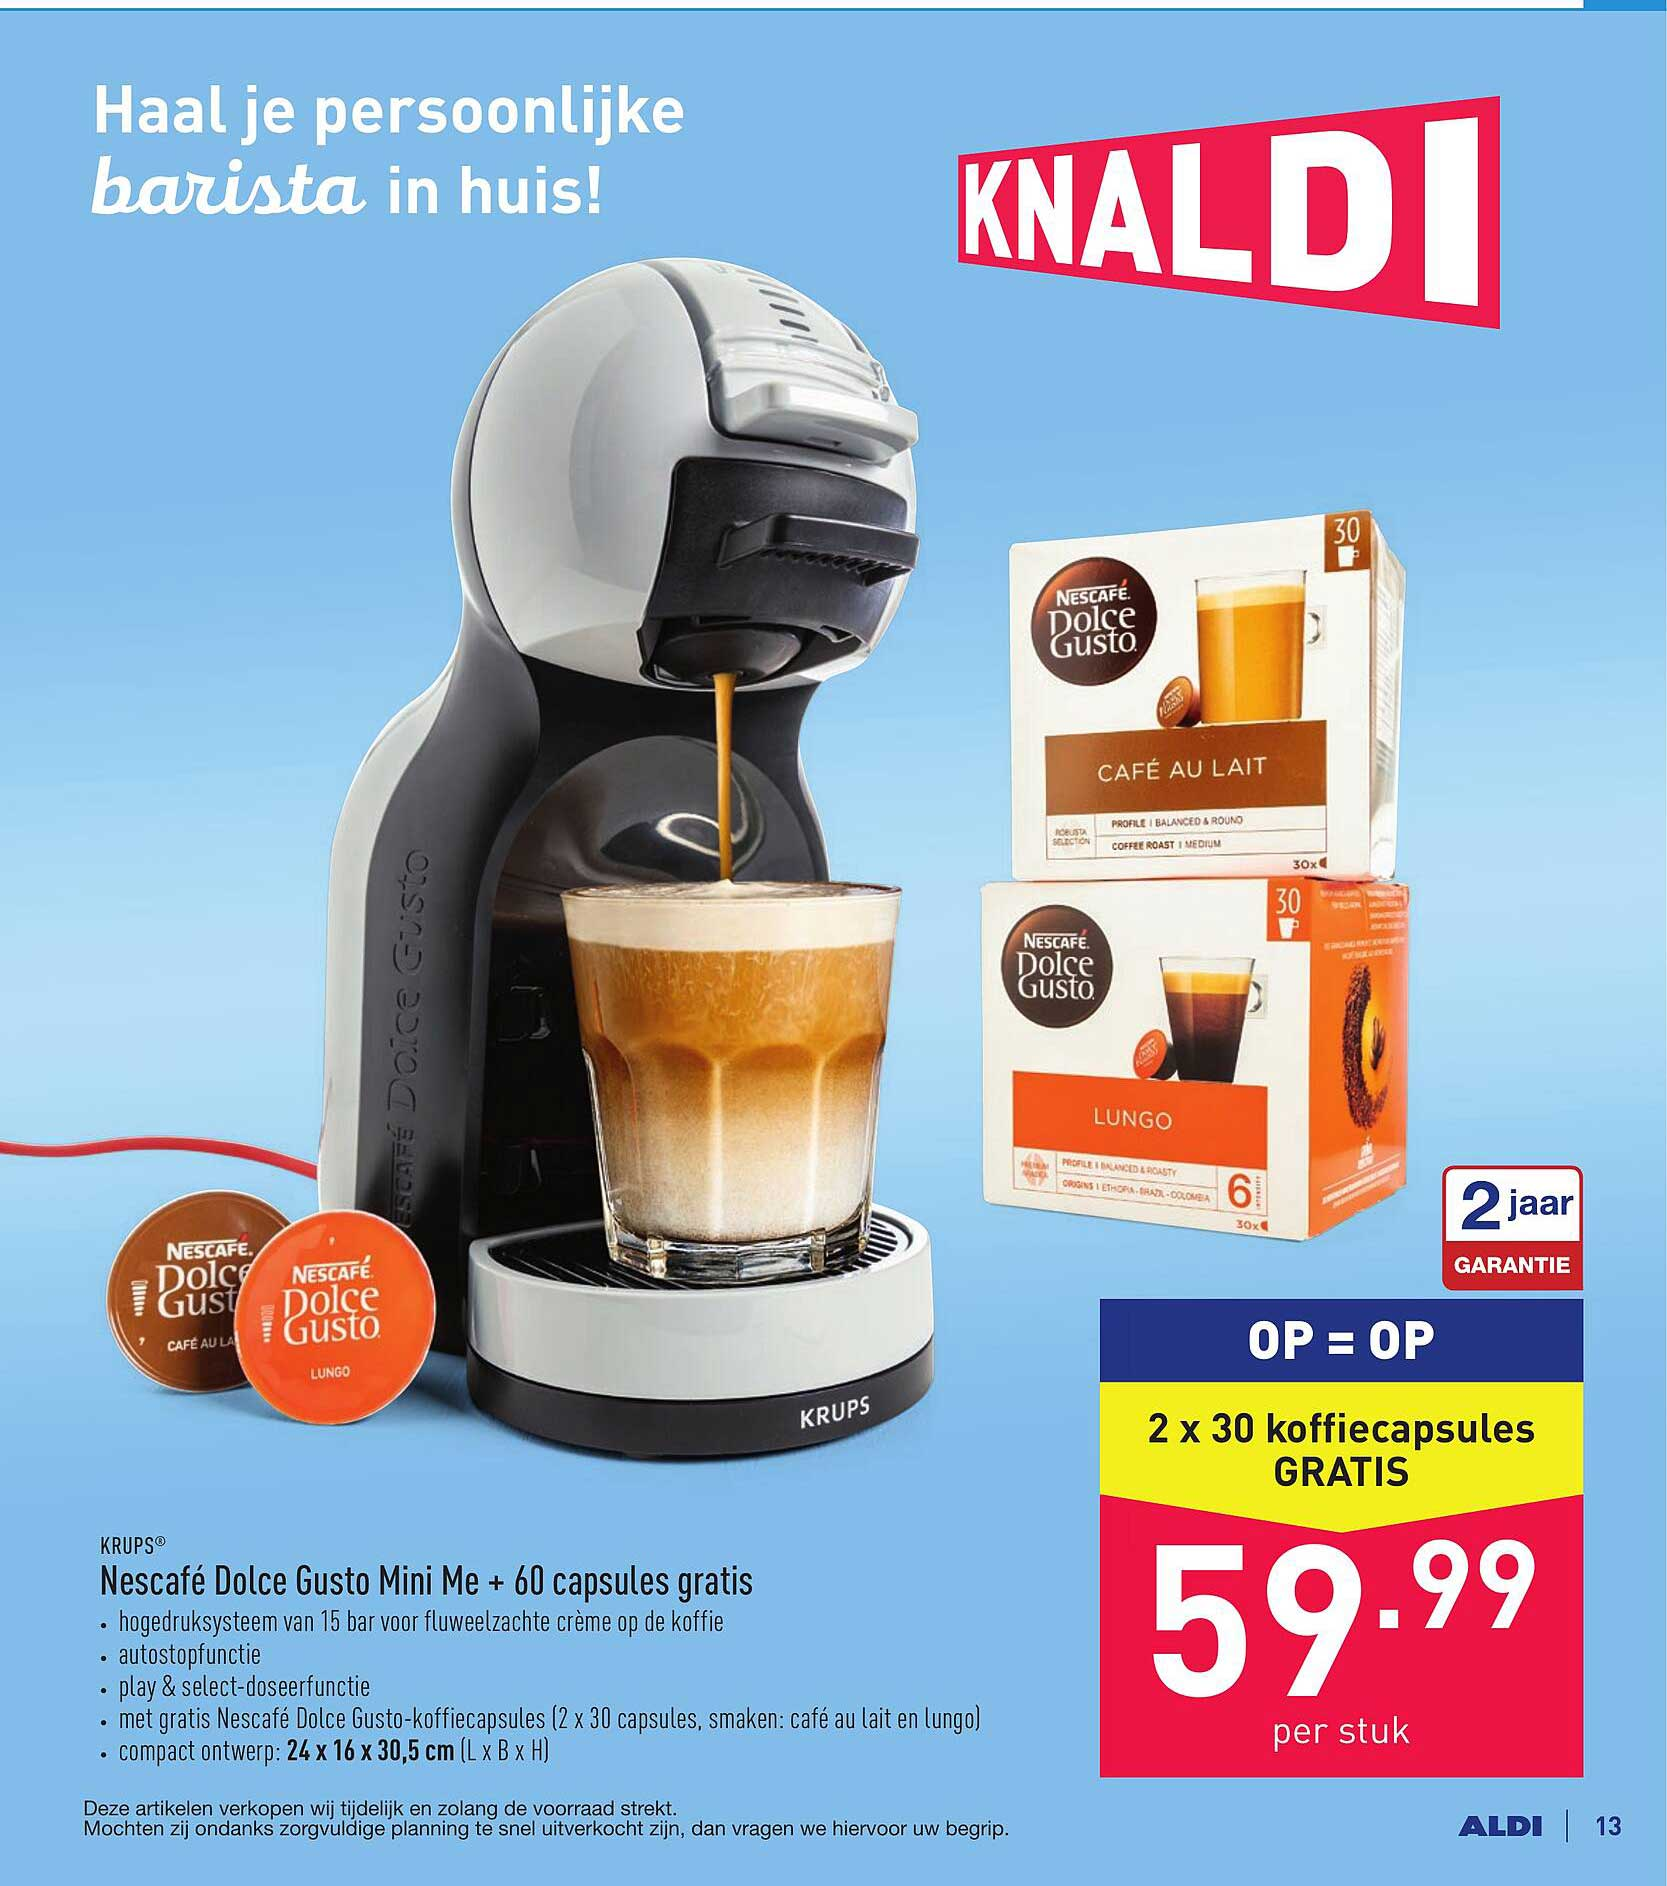 ALDI Krups Nescafe Dolce Gusto Mini Me + 60 Capsules Gratis